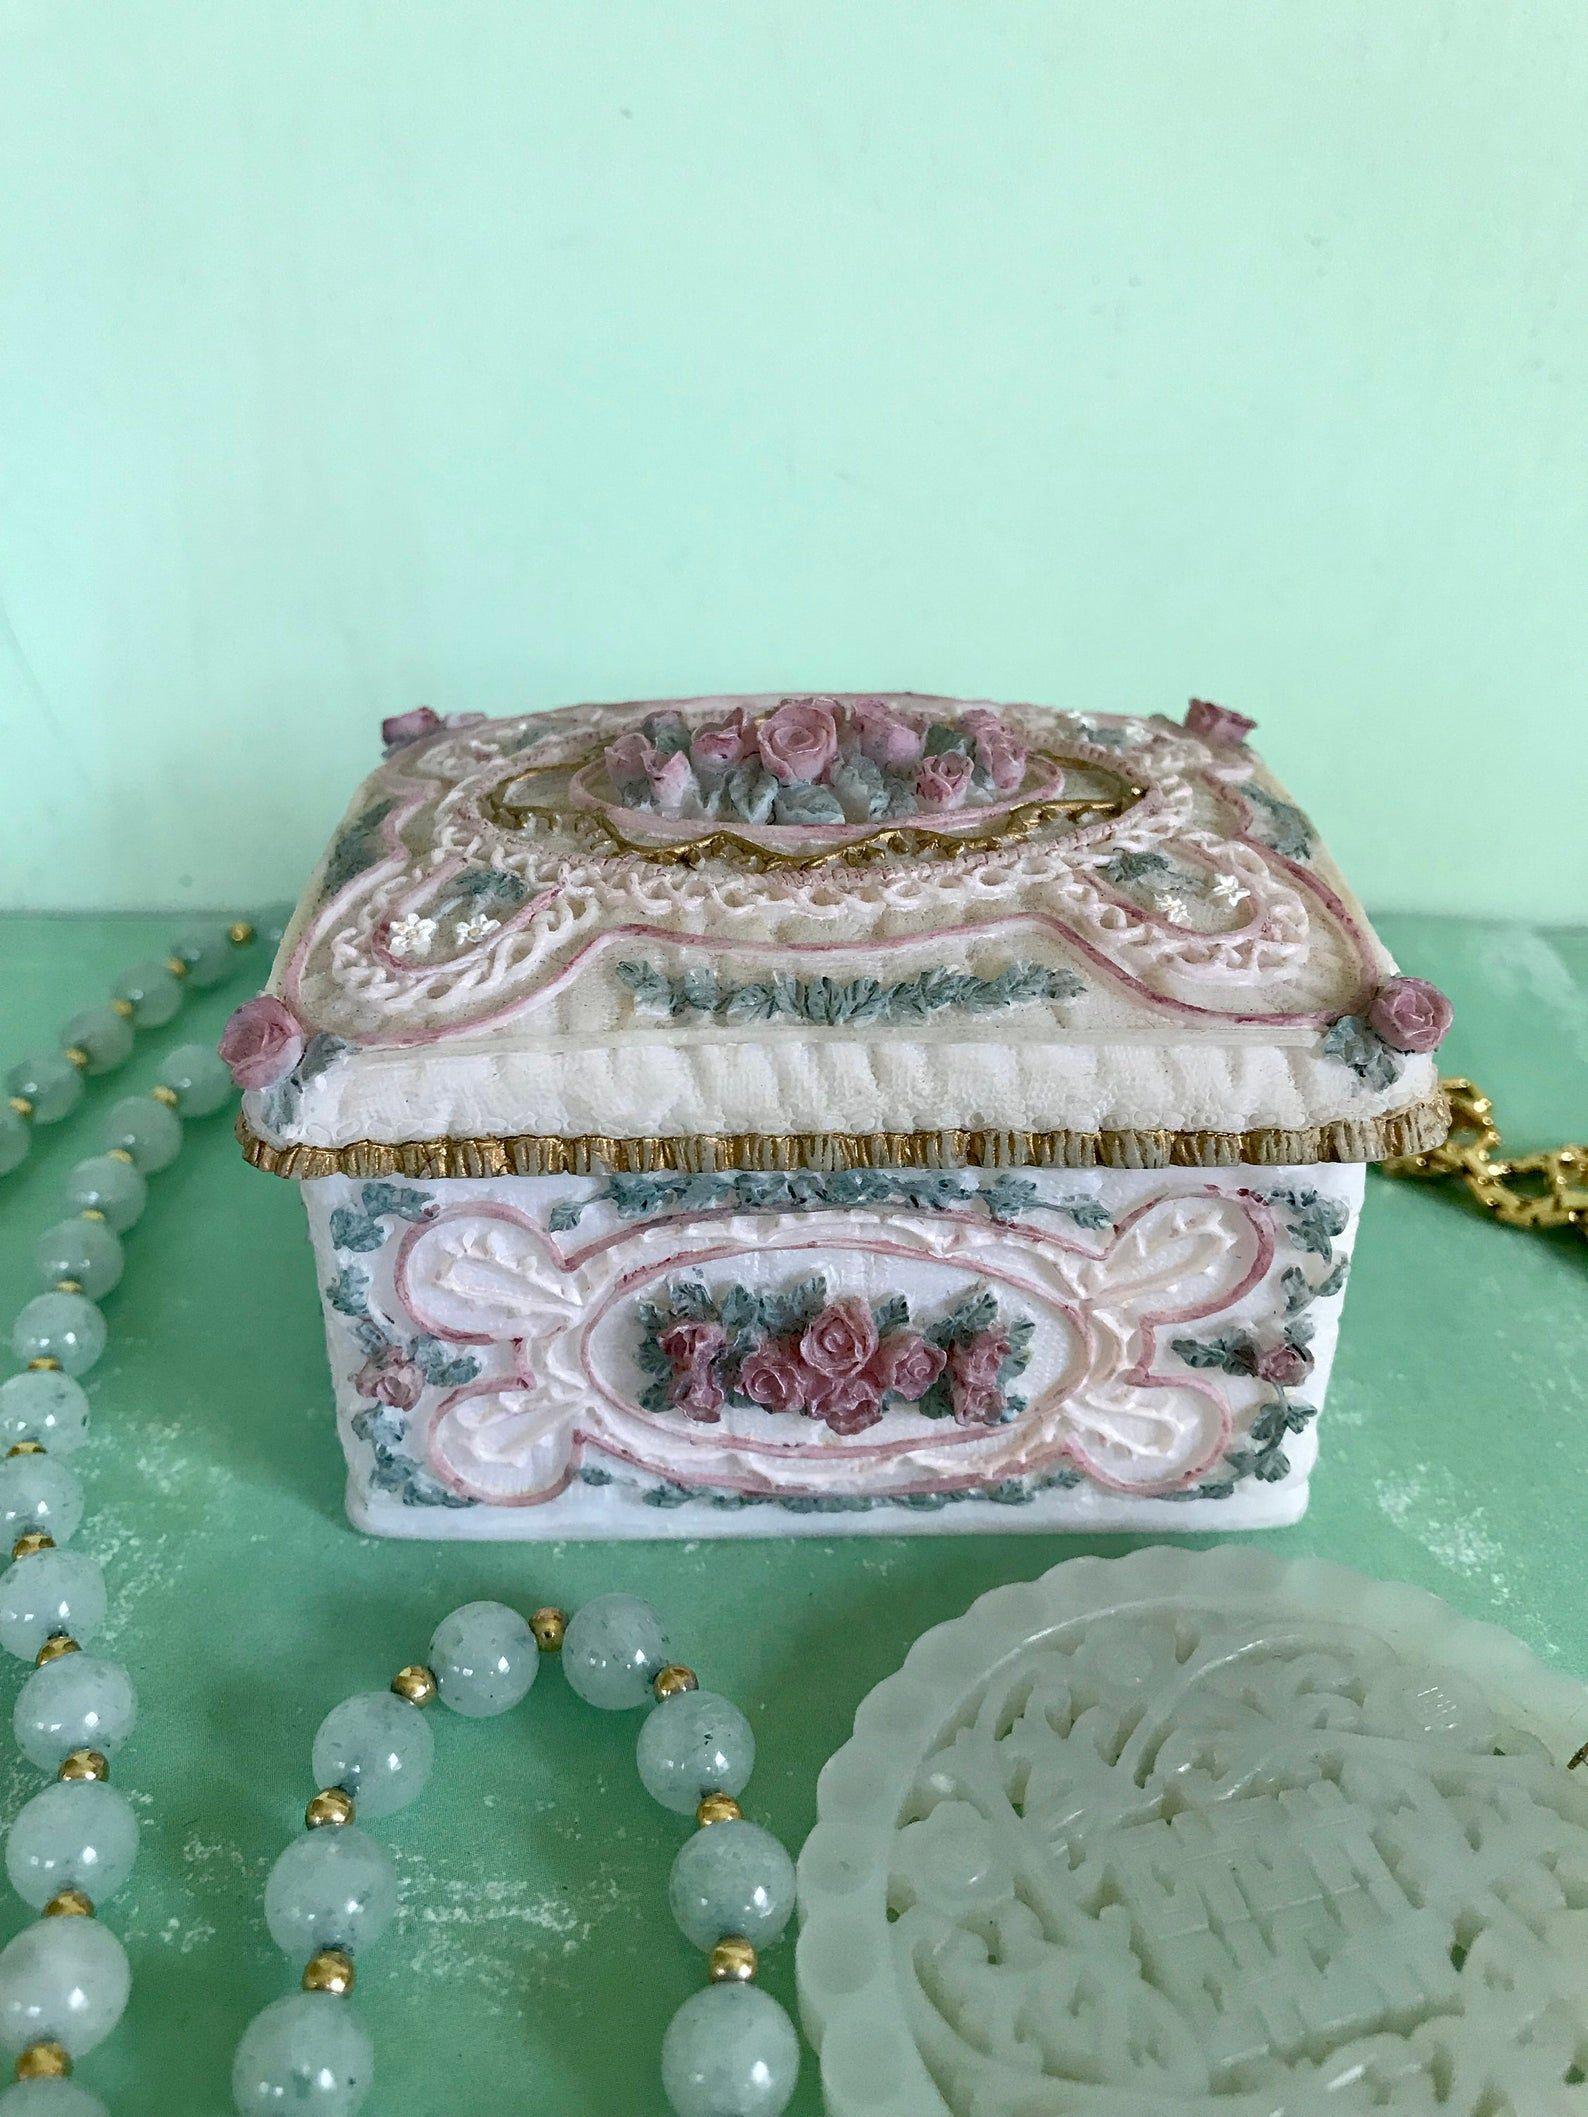 Dezine Trinket Box Handpainted Jewelry Box Collectors Vintage